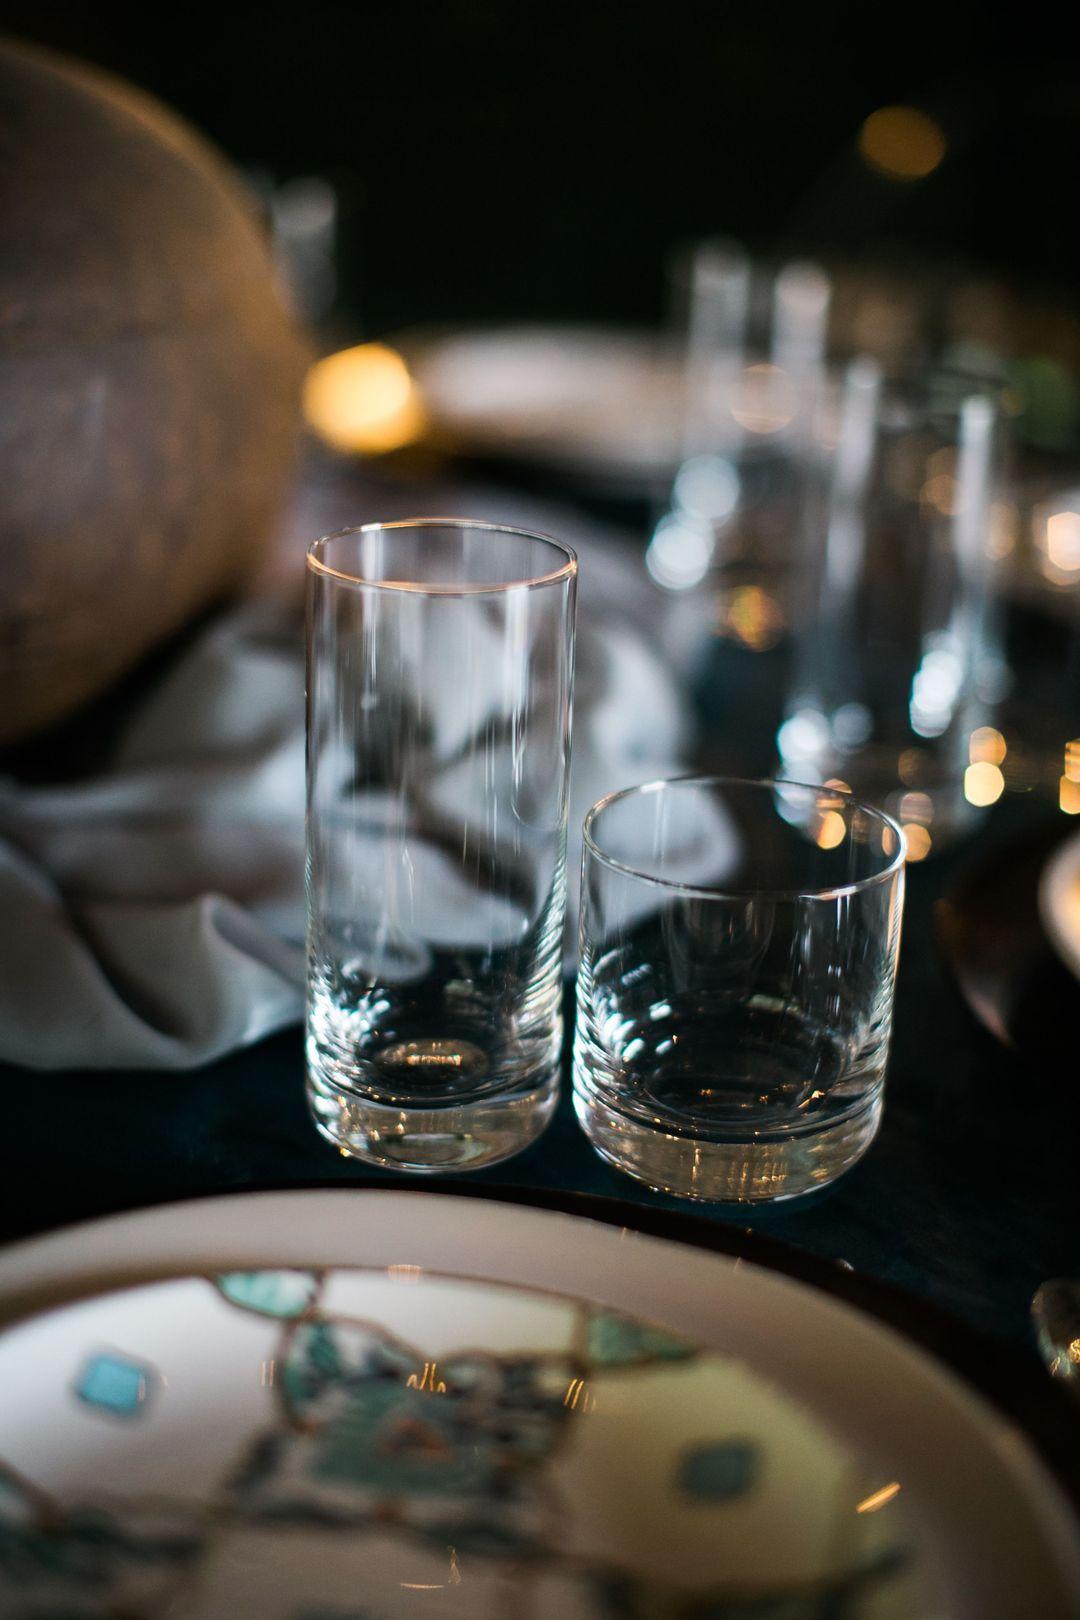 Upton glassware